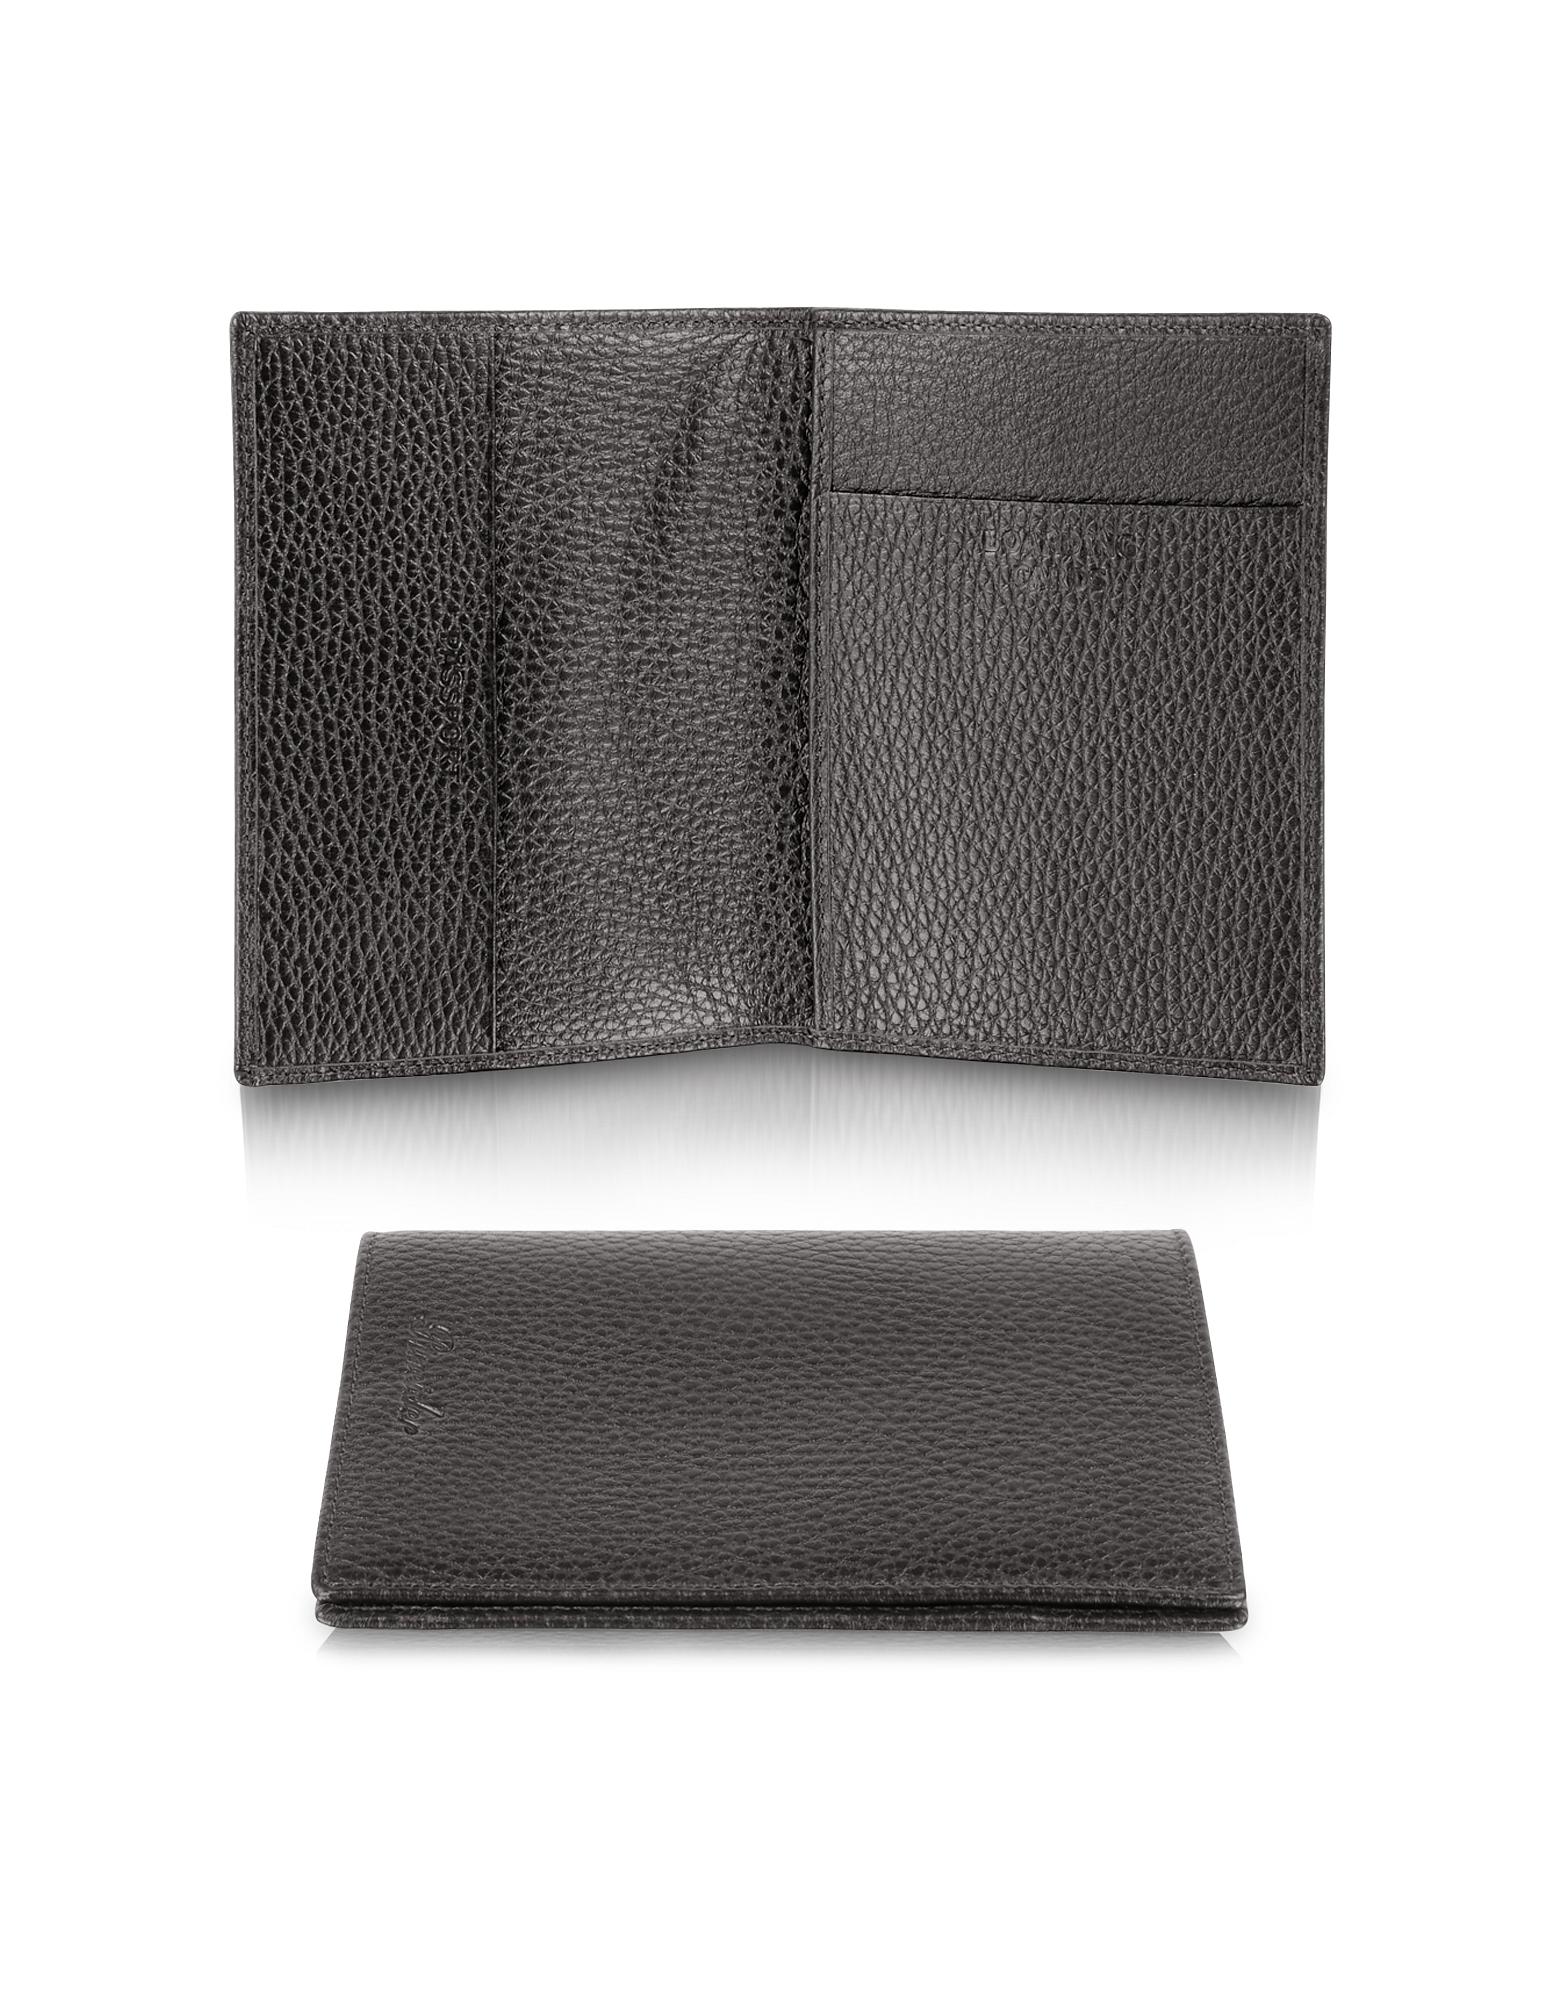 Pineider Wallets, Country - Genuine Leather Passport Holder